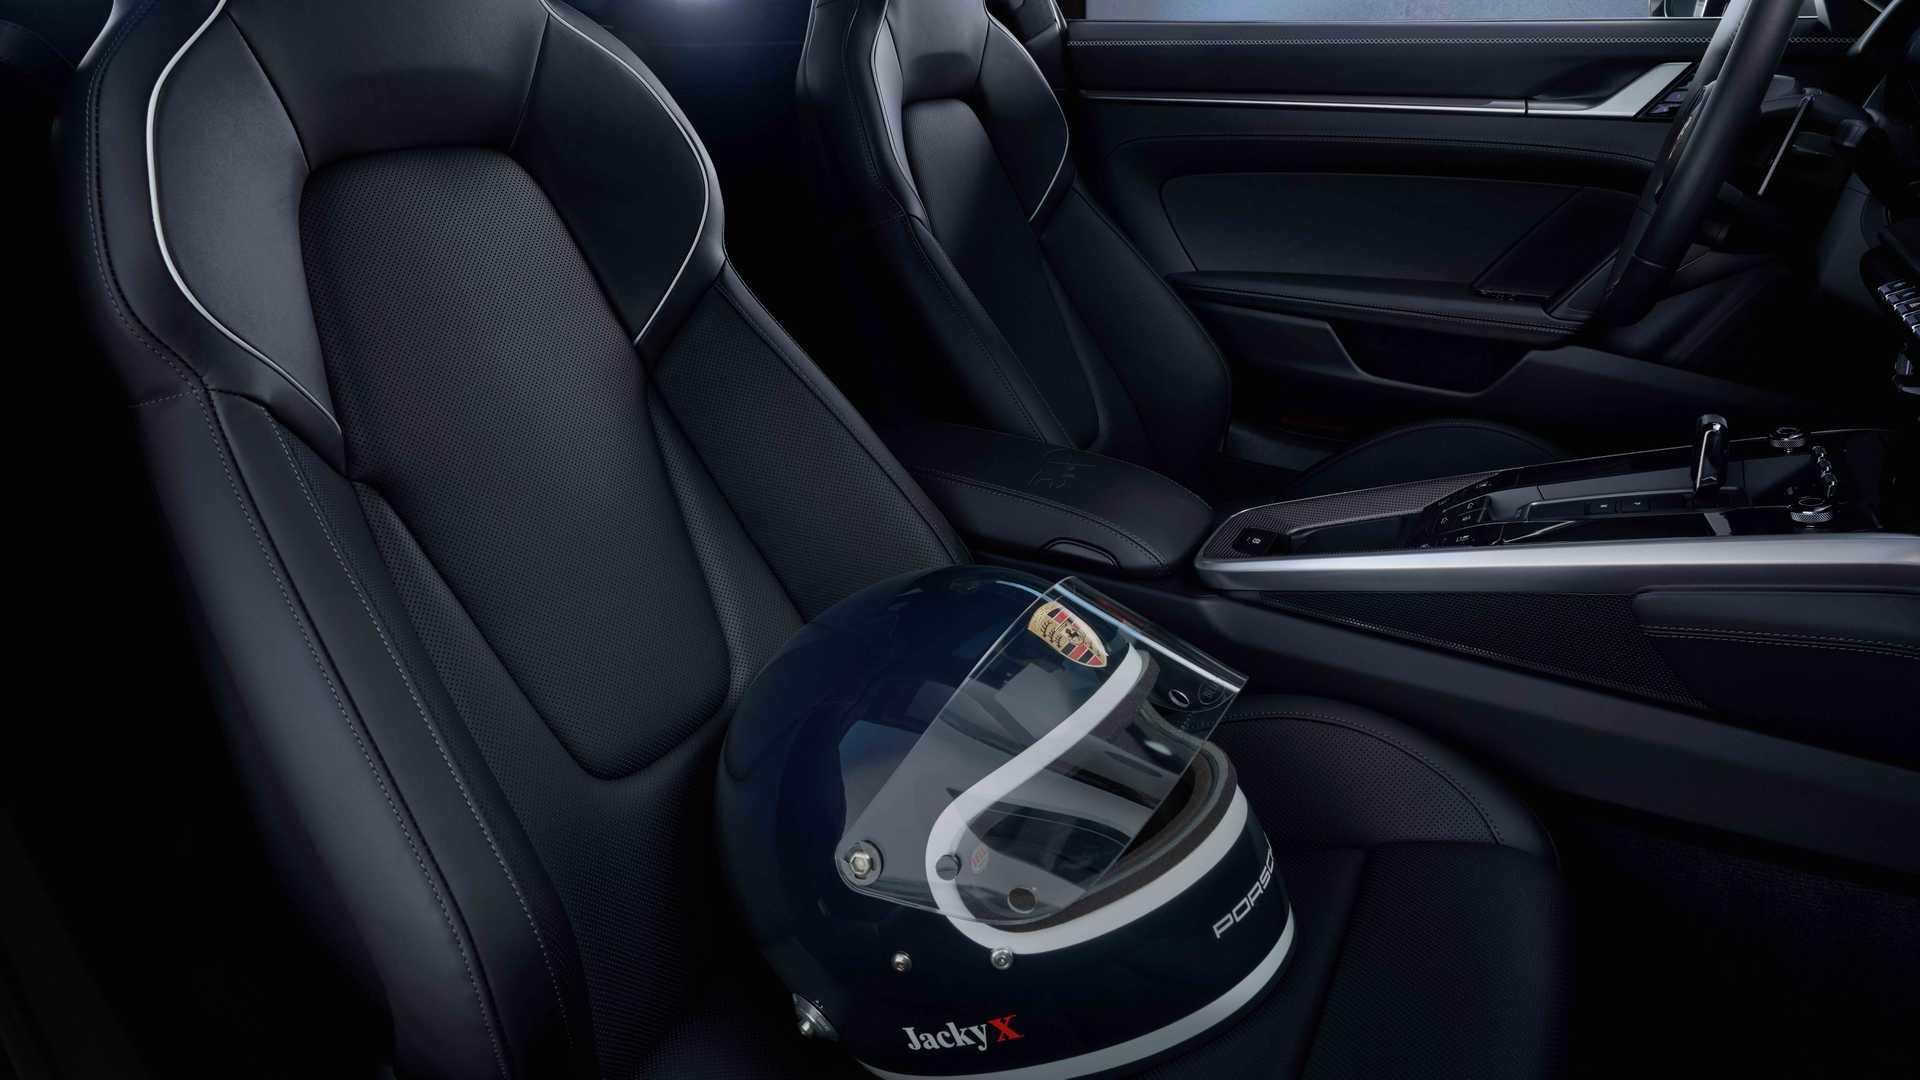 Ra mắt Porsche 911 phiên bản đặc biệt Belgian Legend - 7